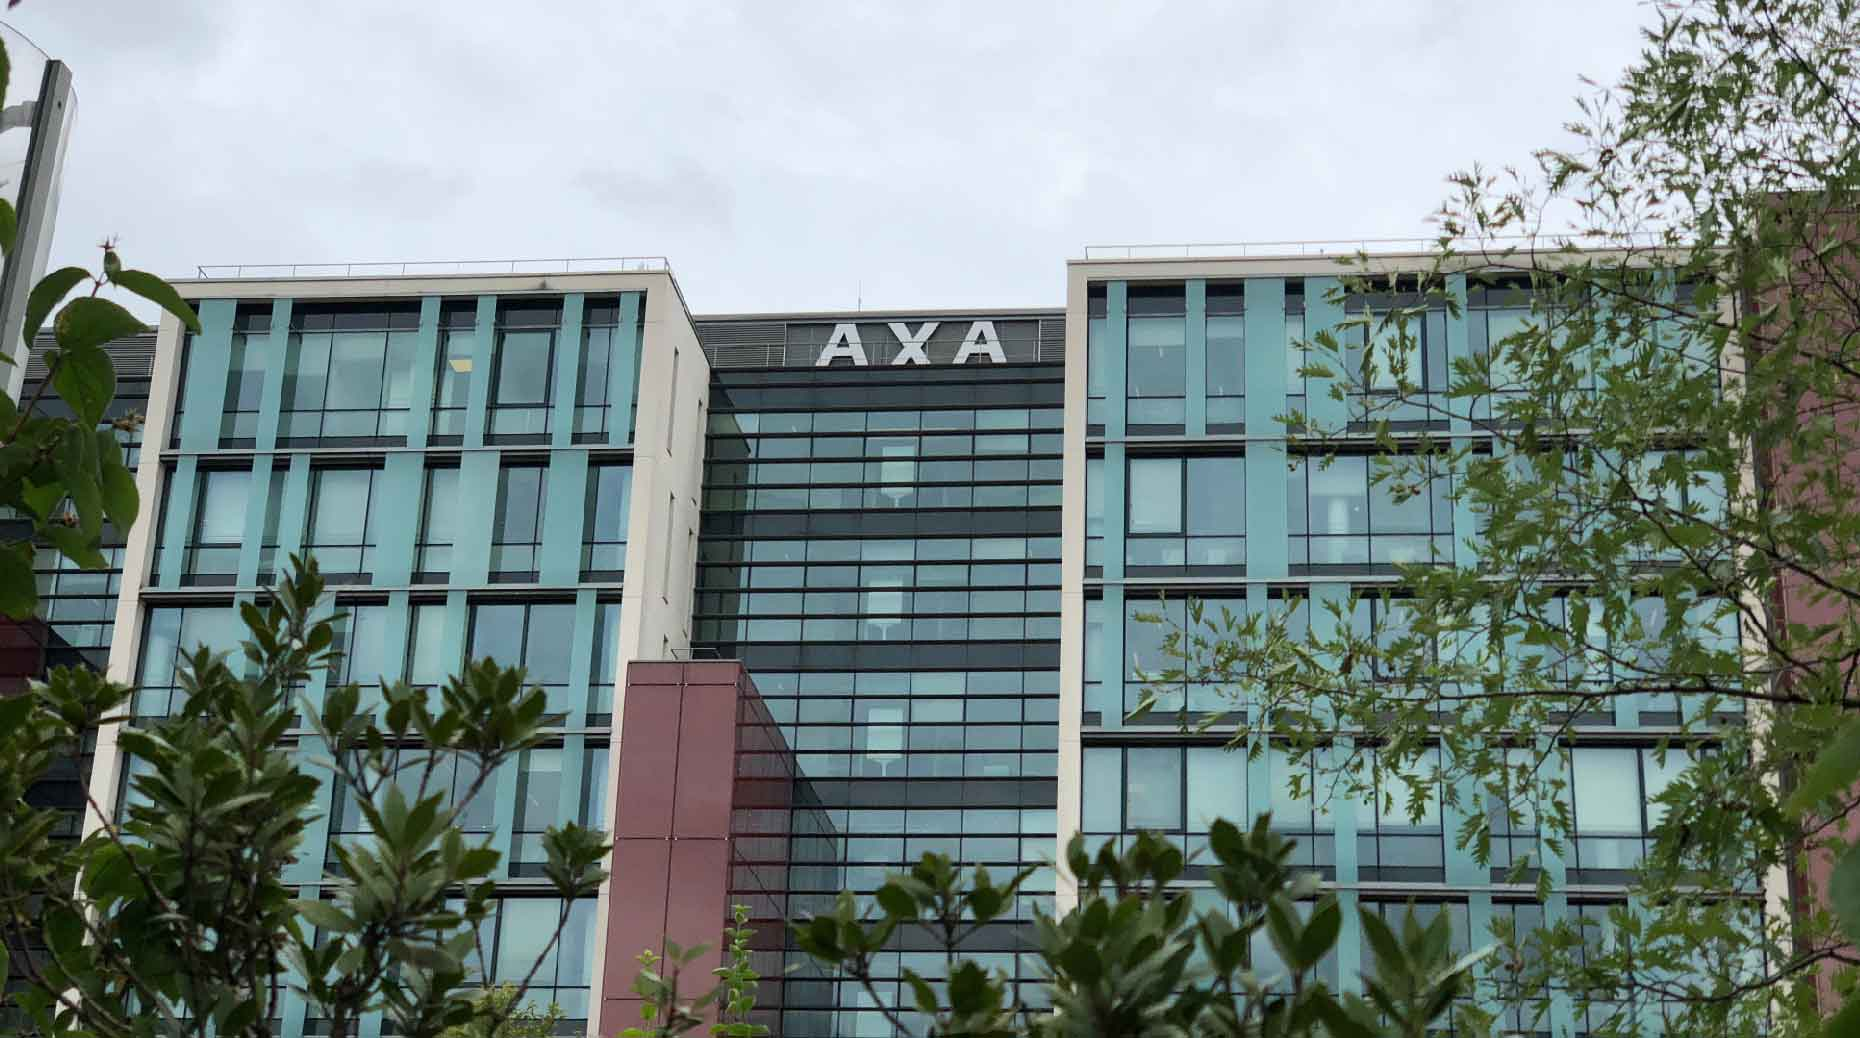 Pertes d'exploitation : Axa condamné à indemniser le gérant de 6 restaurants